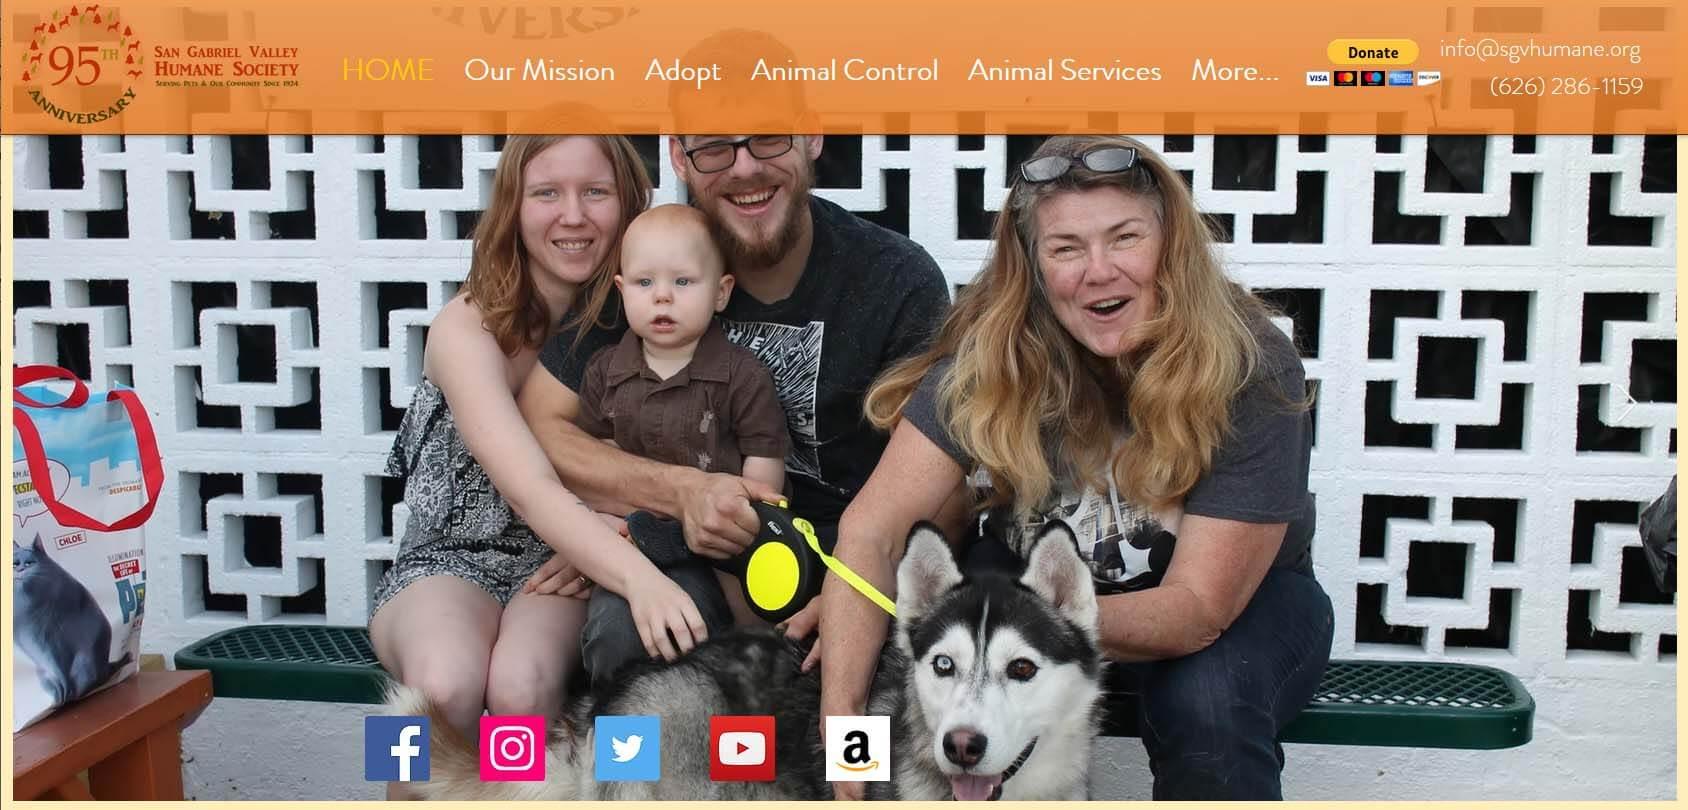 San Gabriel Valley Humane Society Homepage